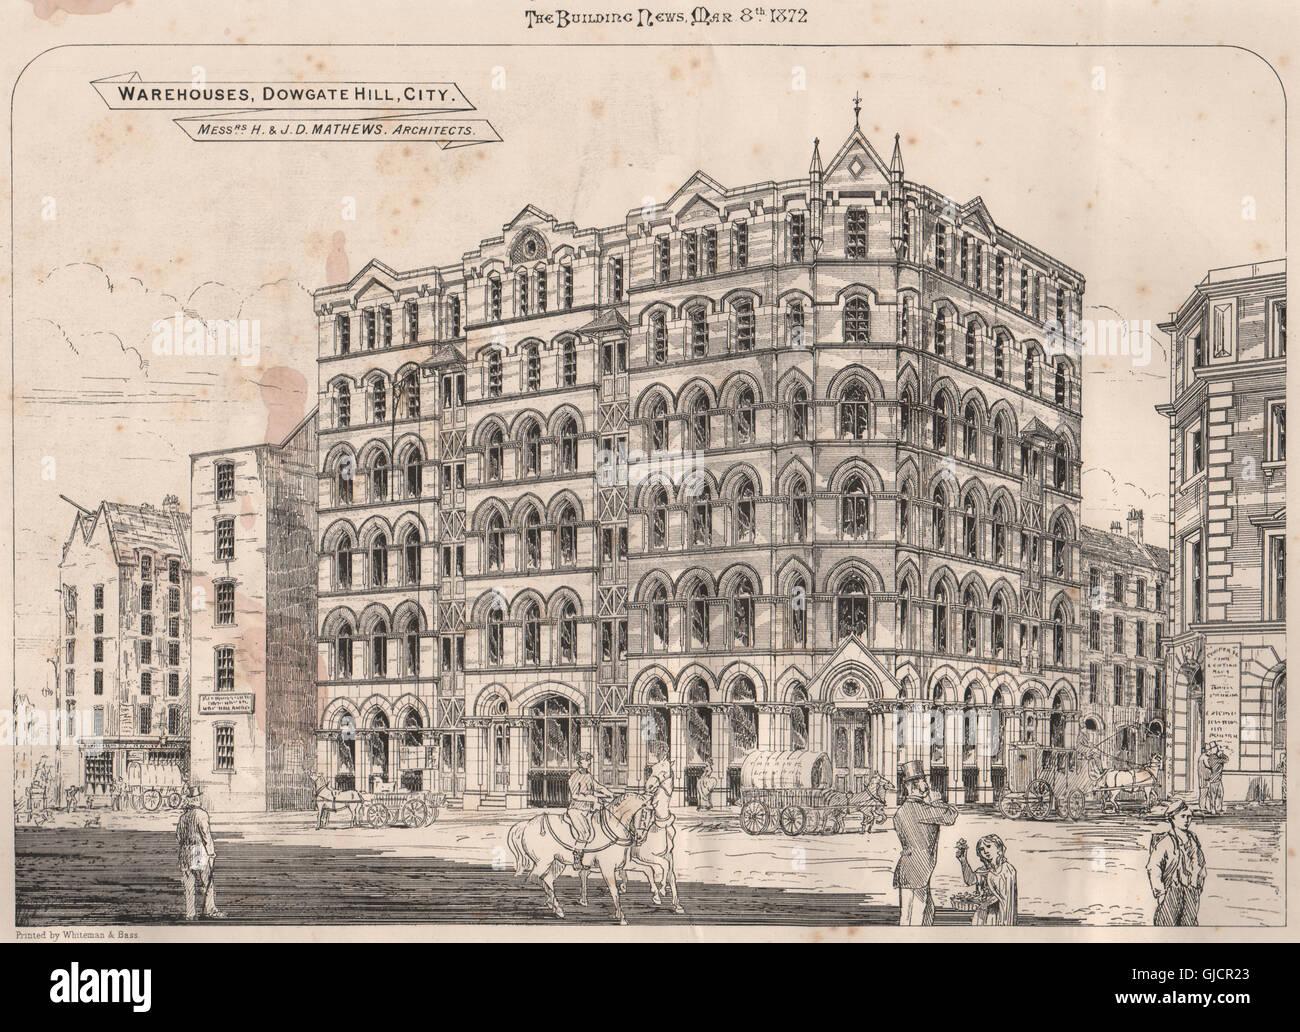 Warehouses, Dowgate Hill, City. Messrs. H. & J. D. Mathews, Architects, 1872 - Stock Image